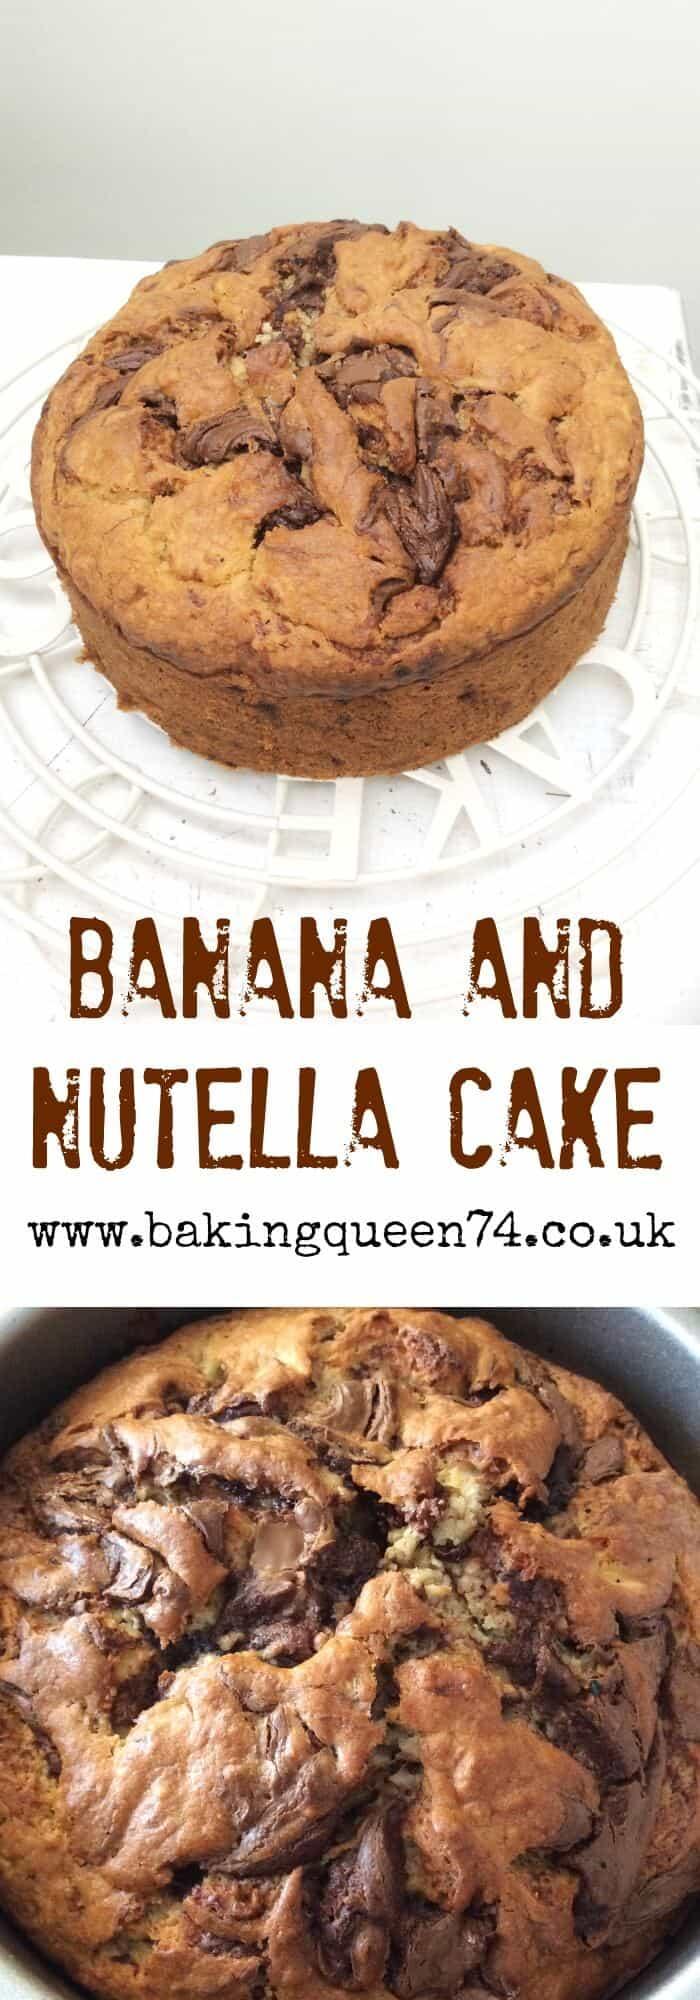 Banana and Nutella Cake - BakingQueen74